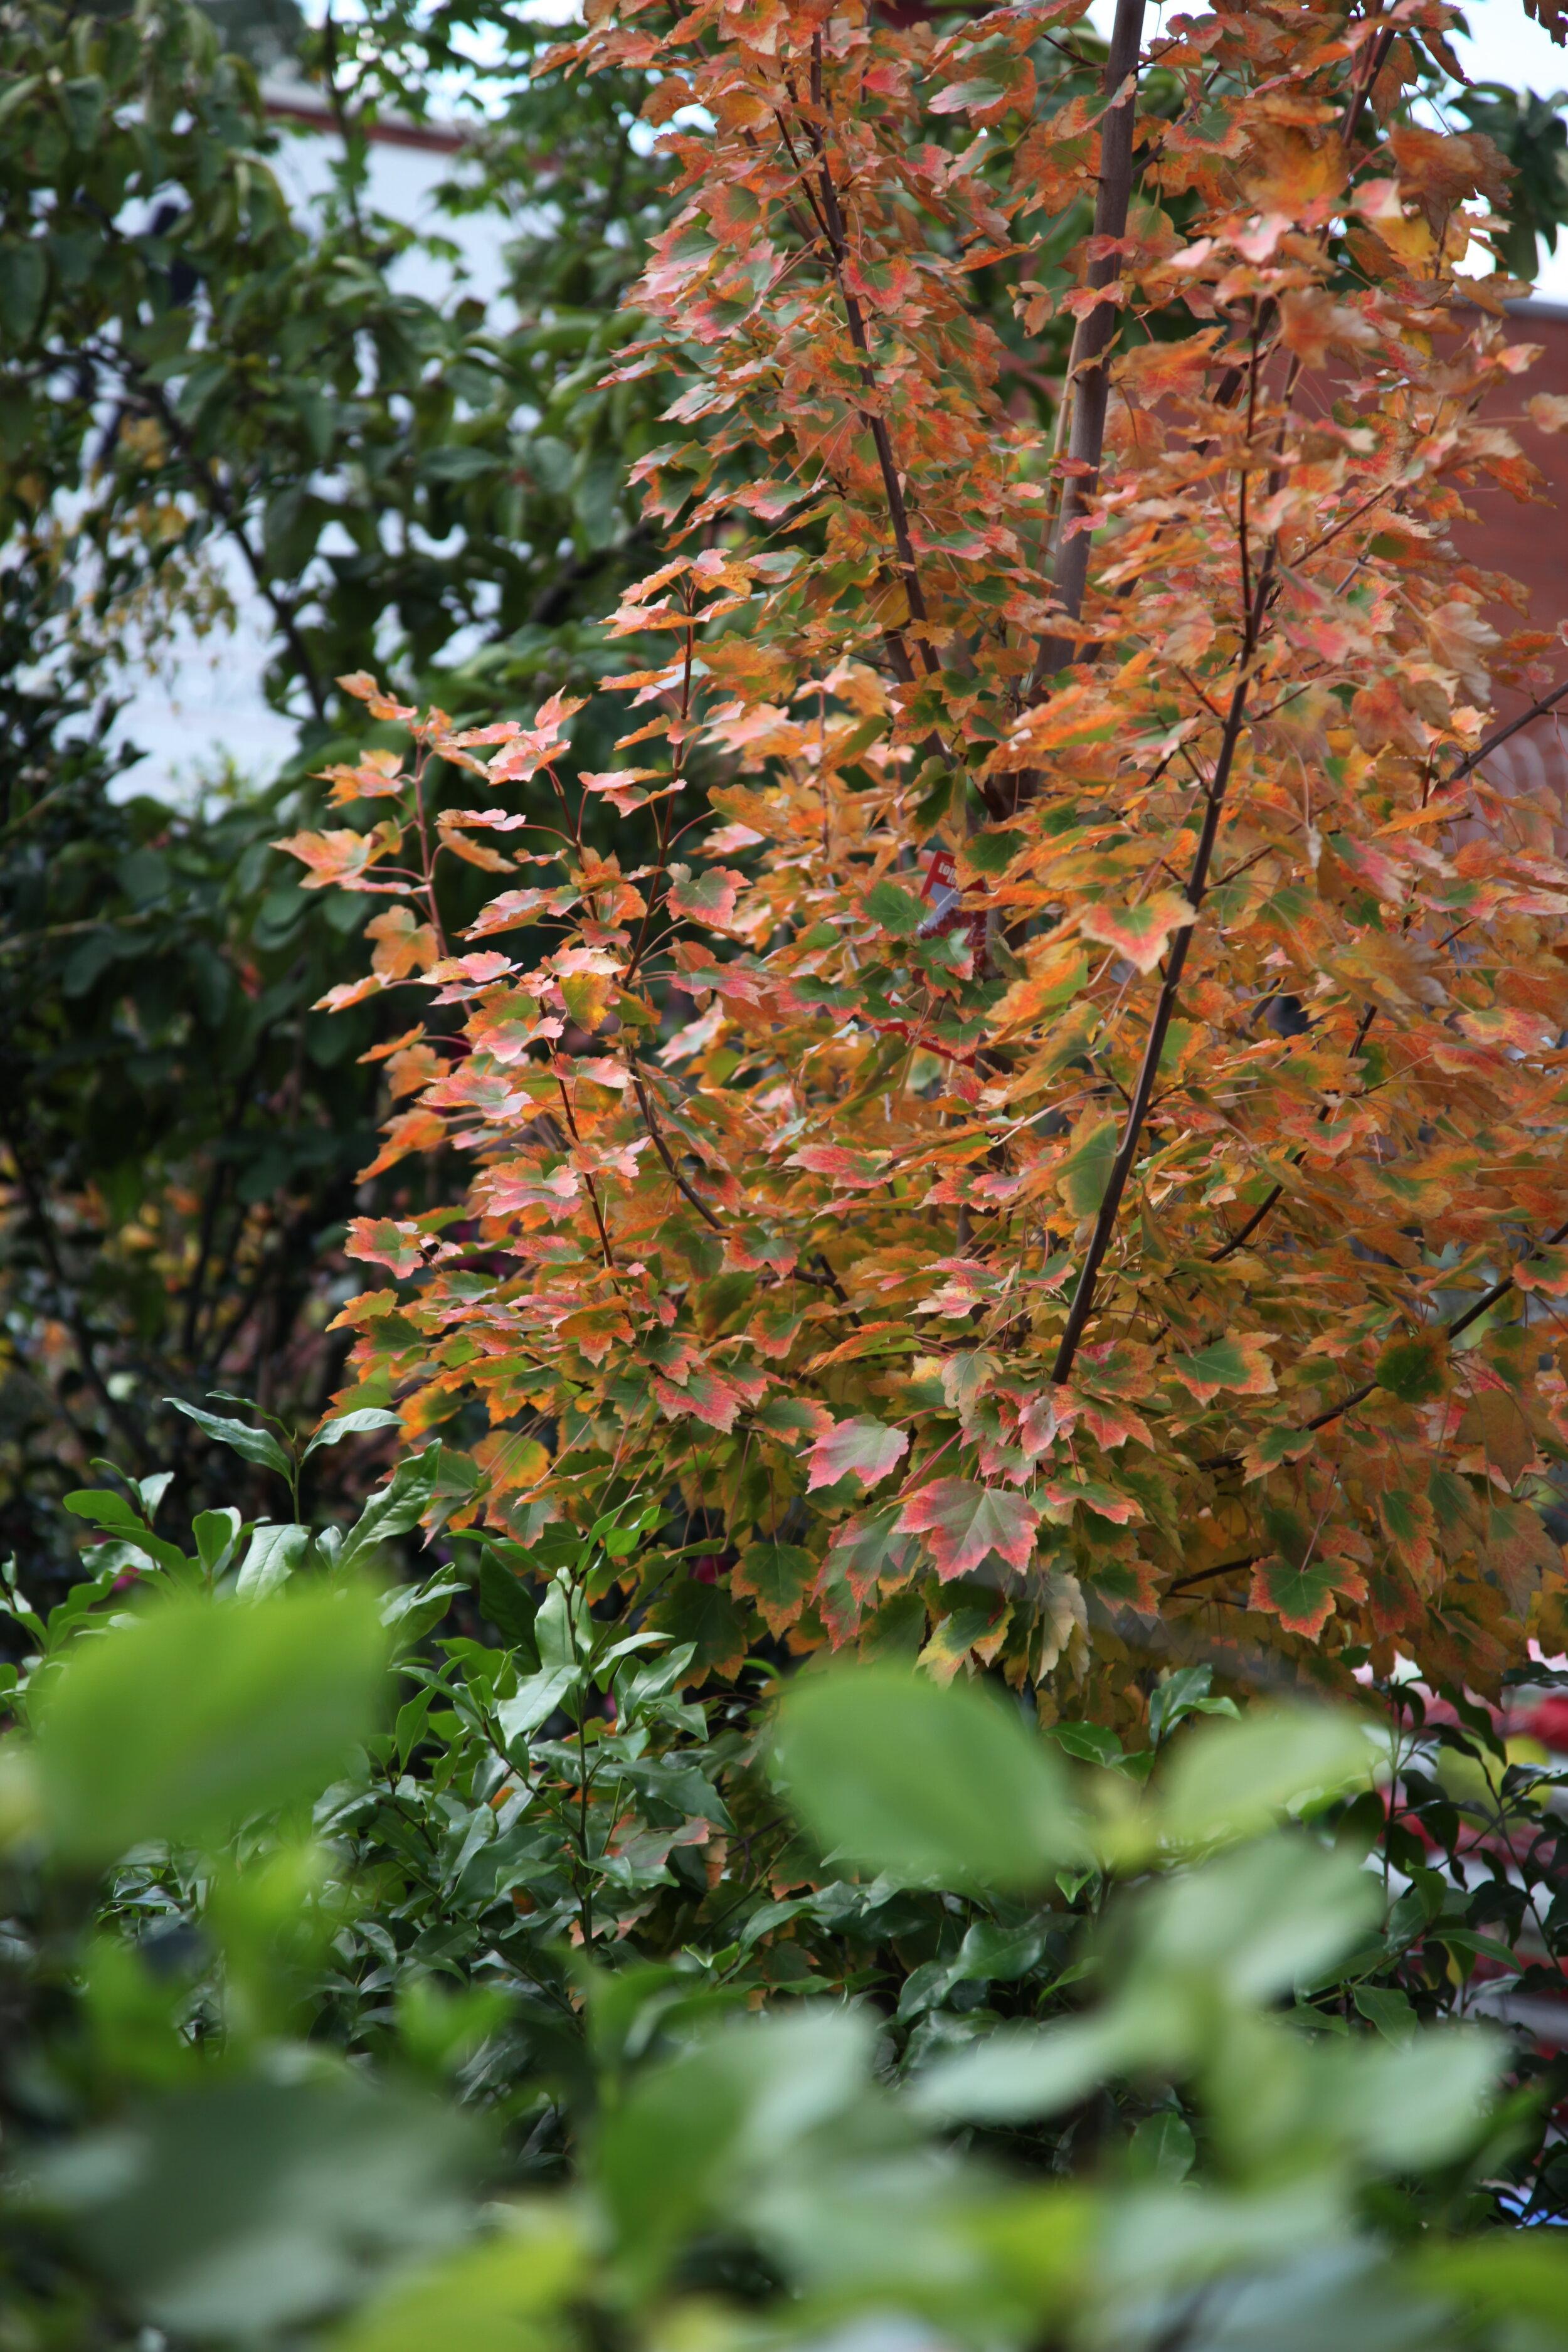 Autumn leaves acer october glory.JPG